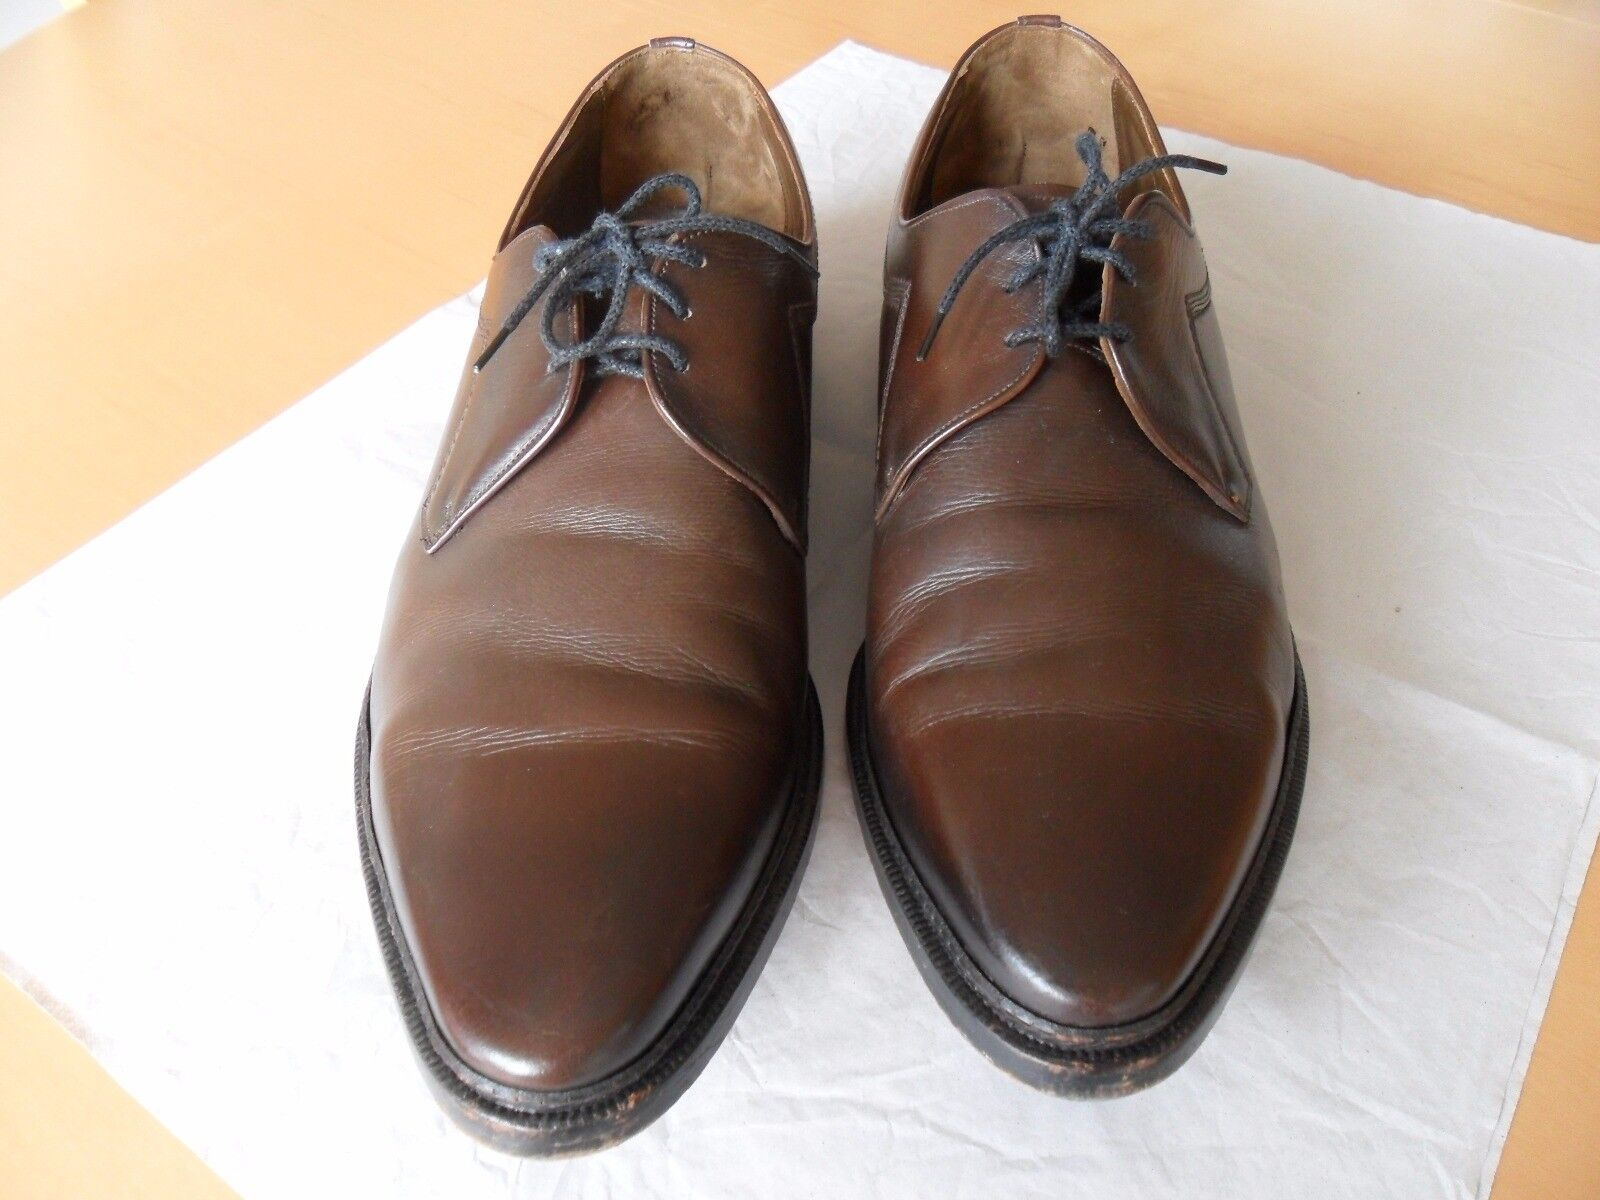 Herrenschuhe, Schuhe, Roland Gr. 44, braun, Marke Roland Schuhe, 029cd9